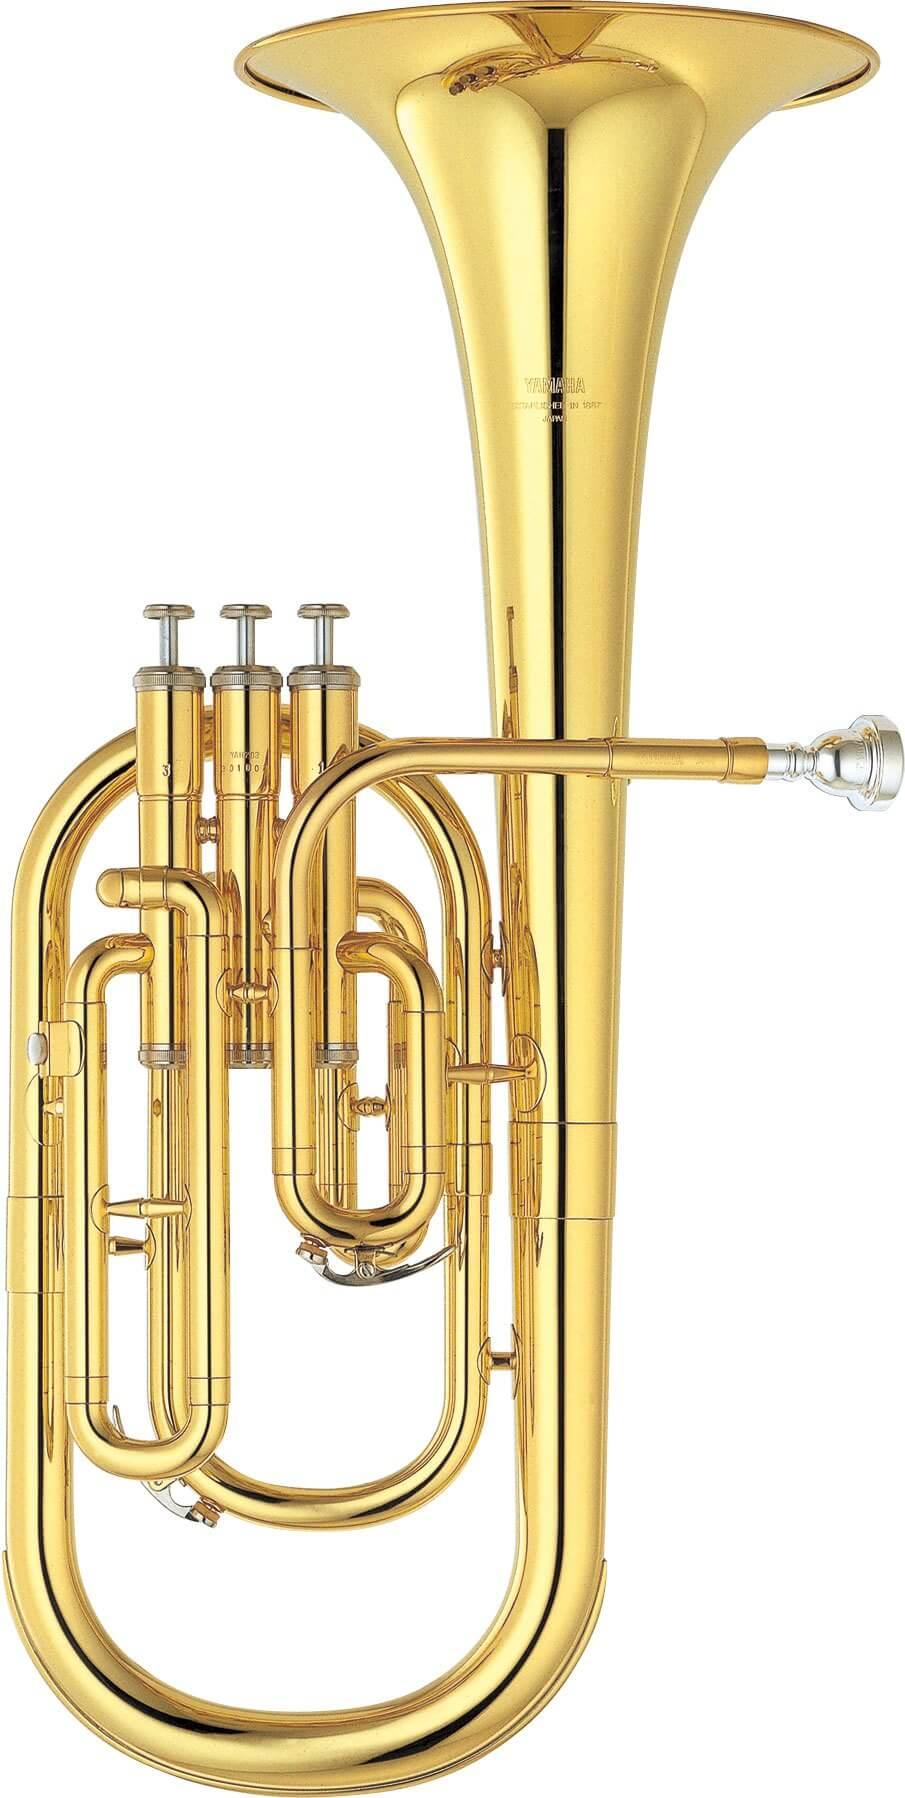 Trompa Alto Yamaha Yah 203 Lacada